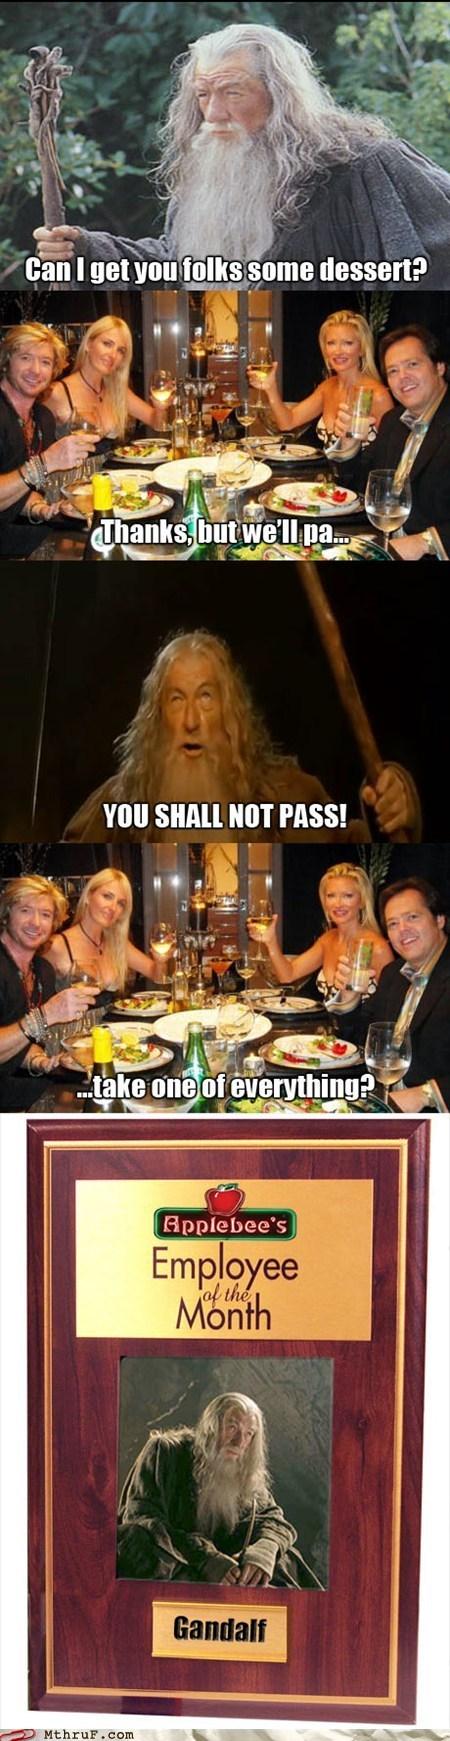 applebees,dessert,gandalf,ordering dessert,you shall not pass